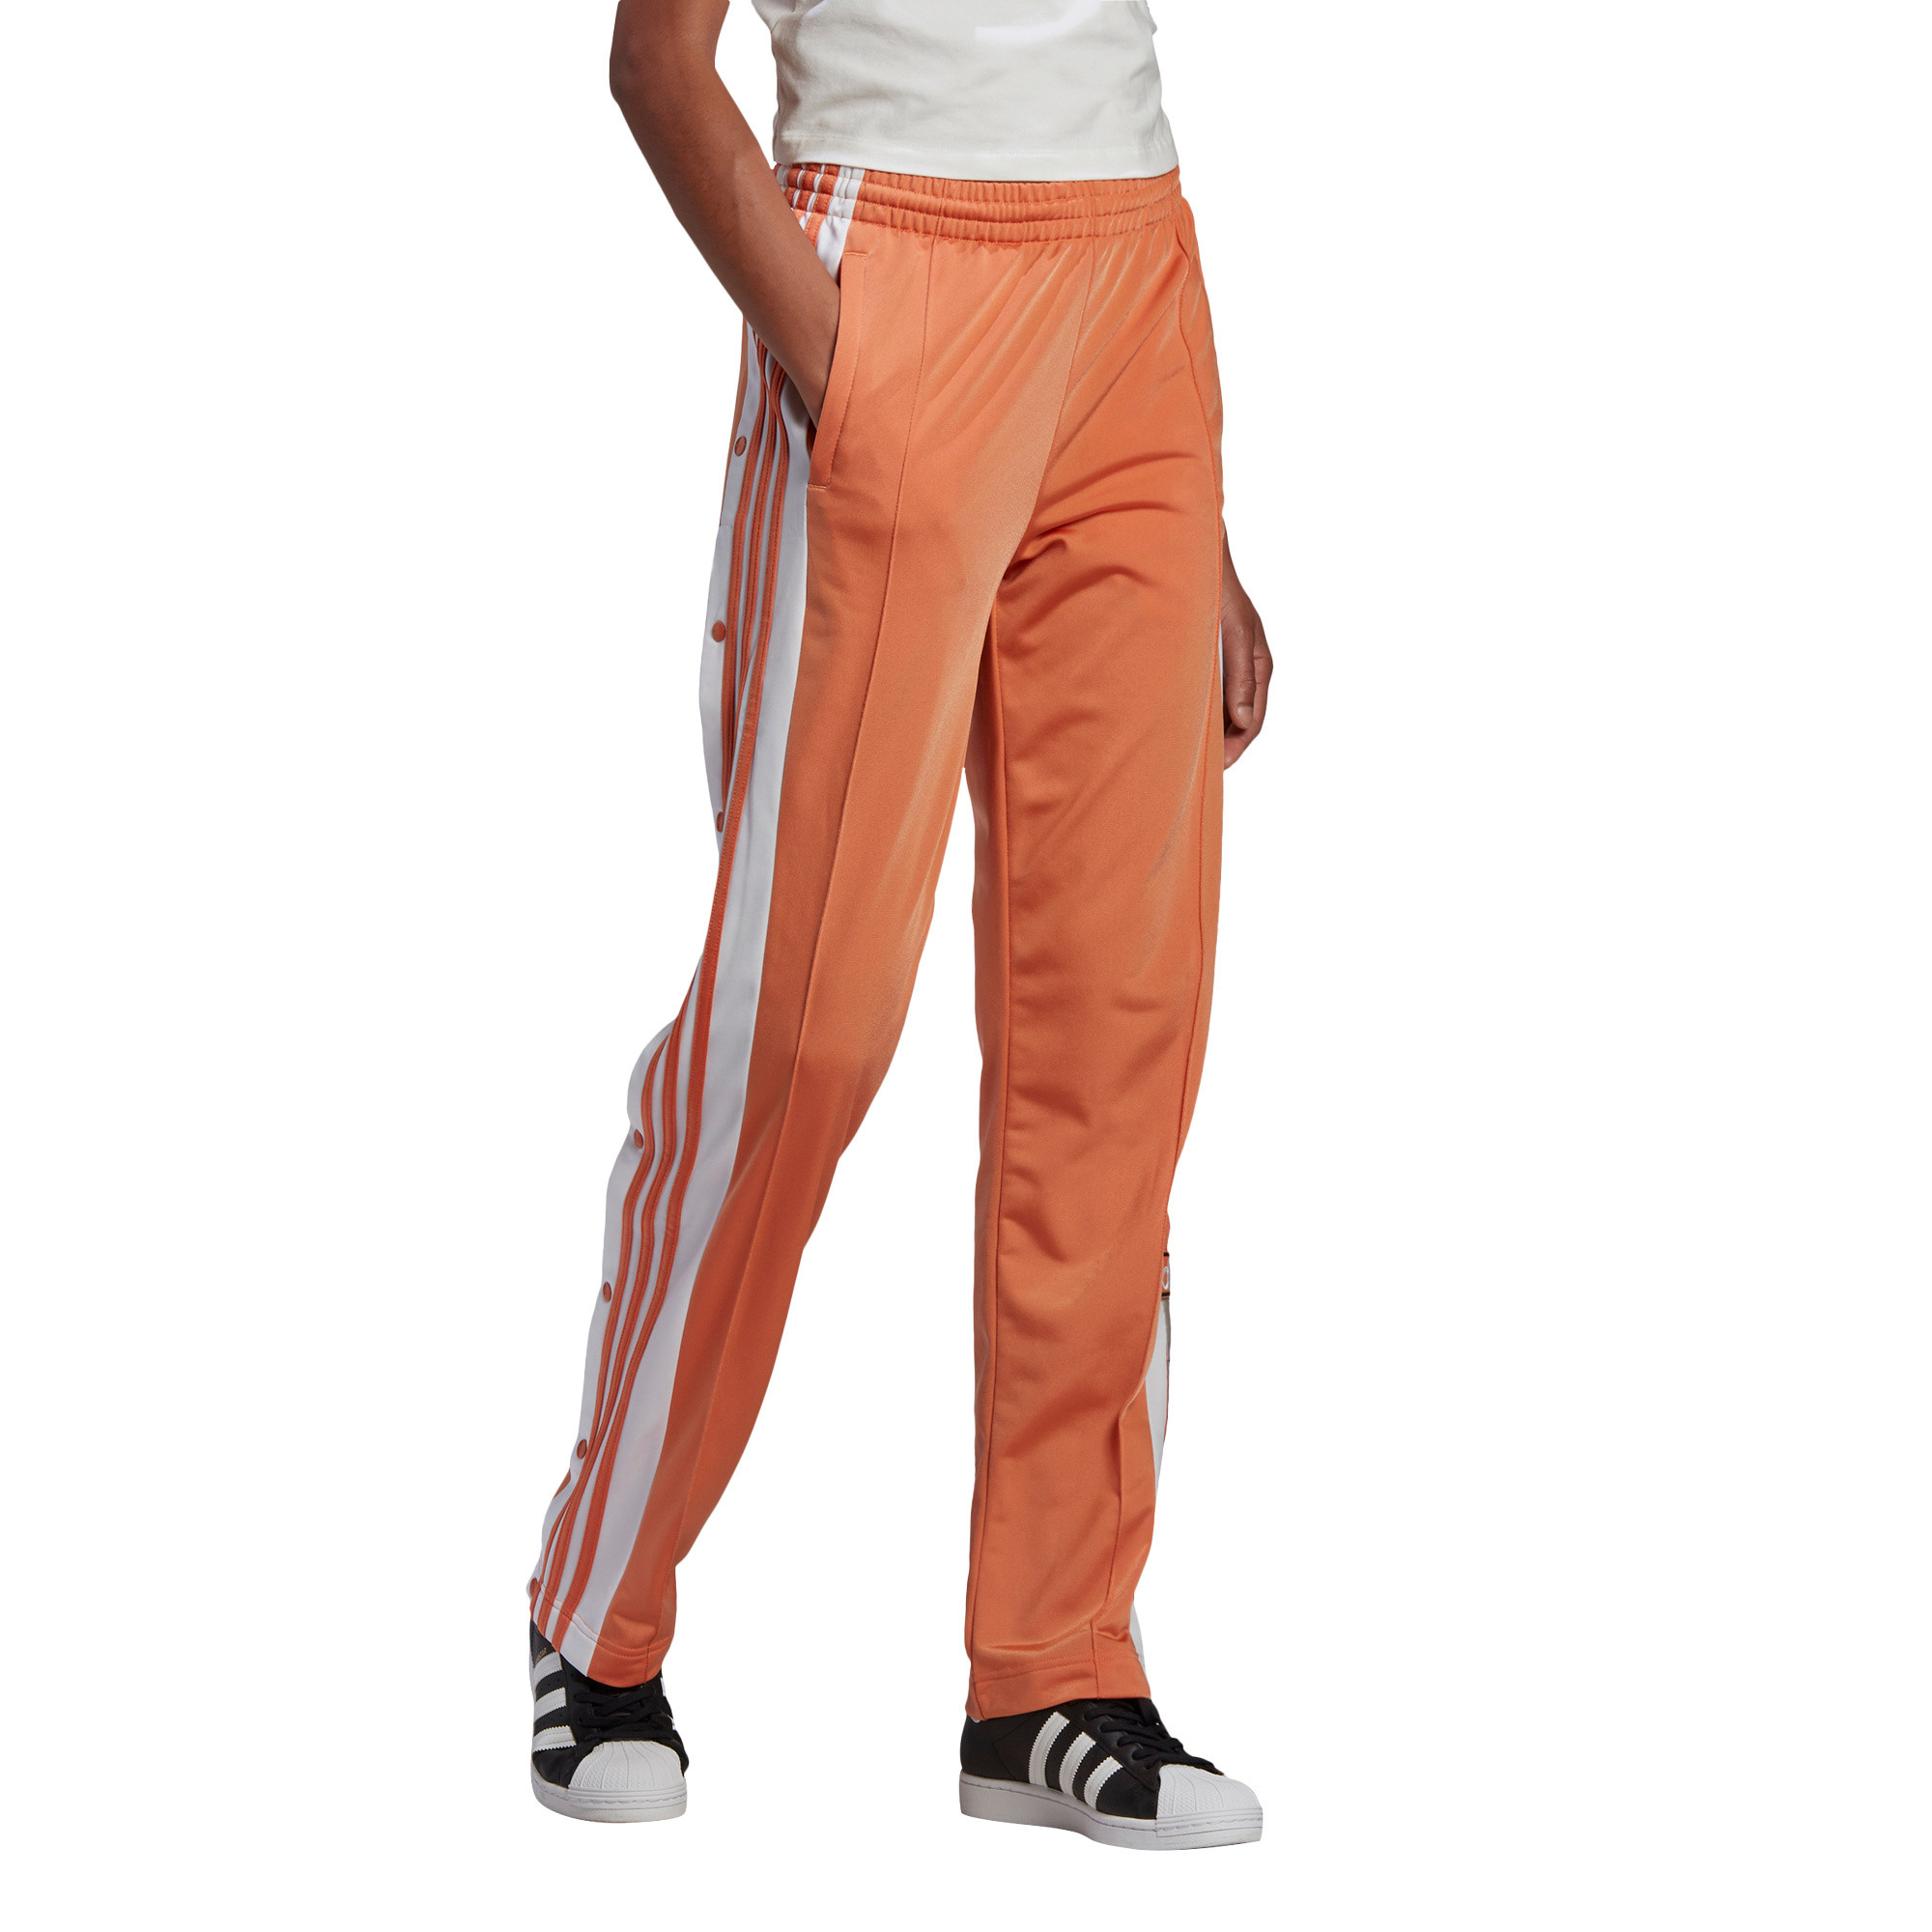 Pantaloni tuta adicolor Classics adibreak, Marrone bronzo, large image number 5